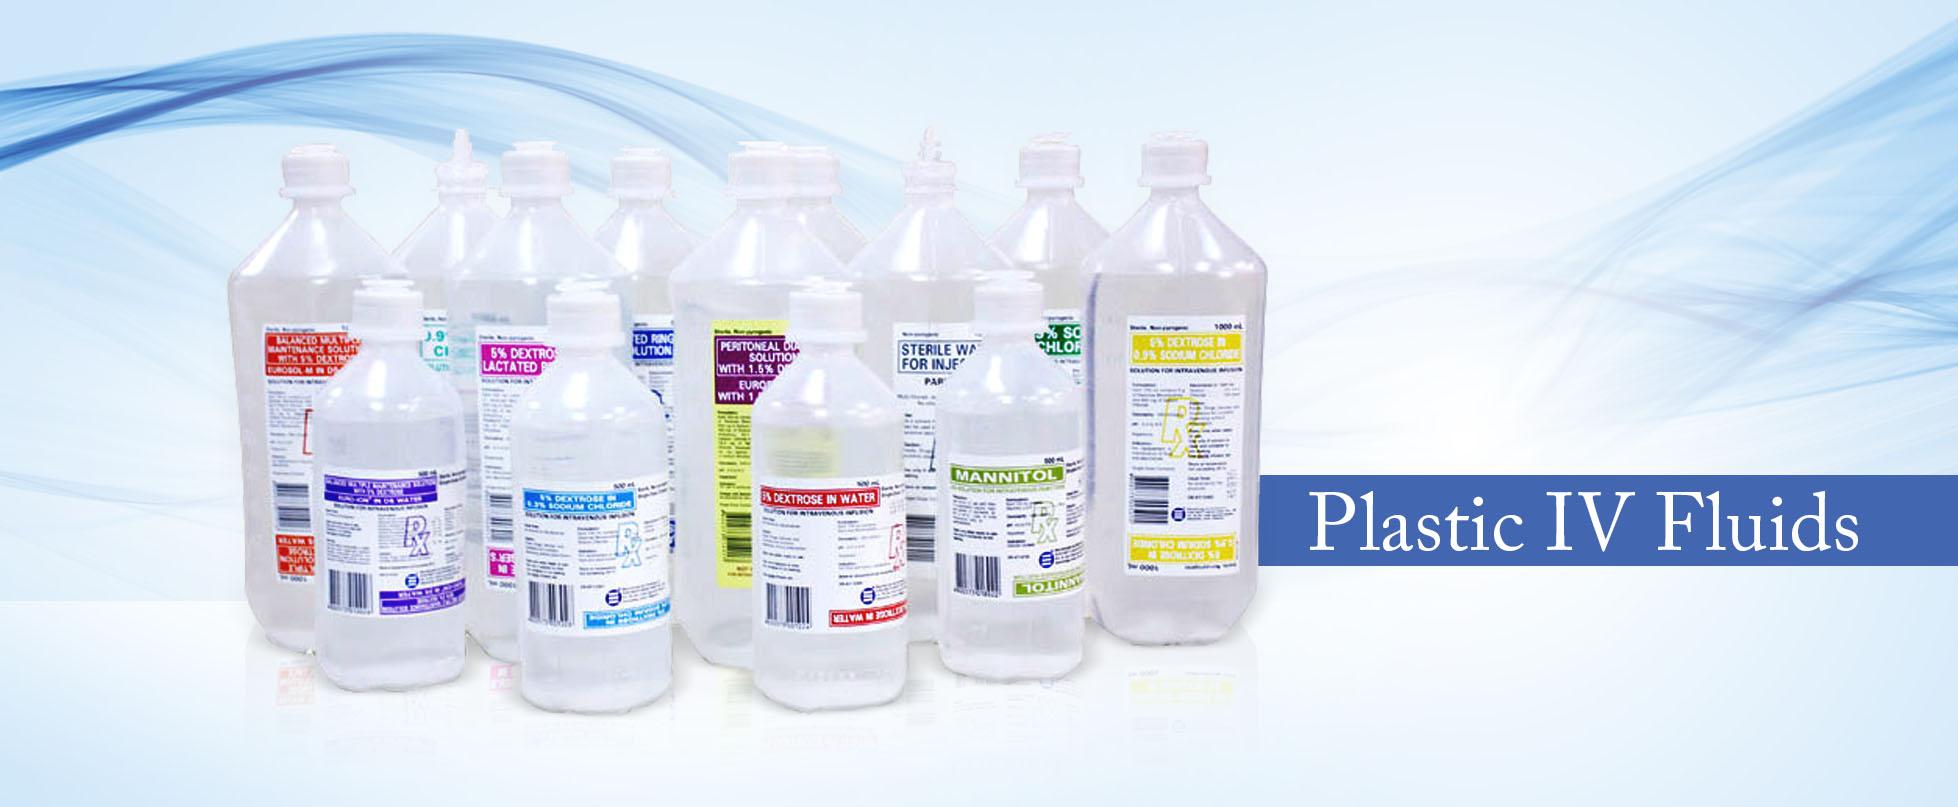 Plastic IV Fluids